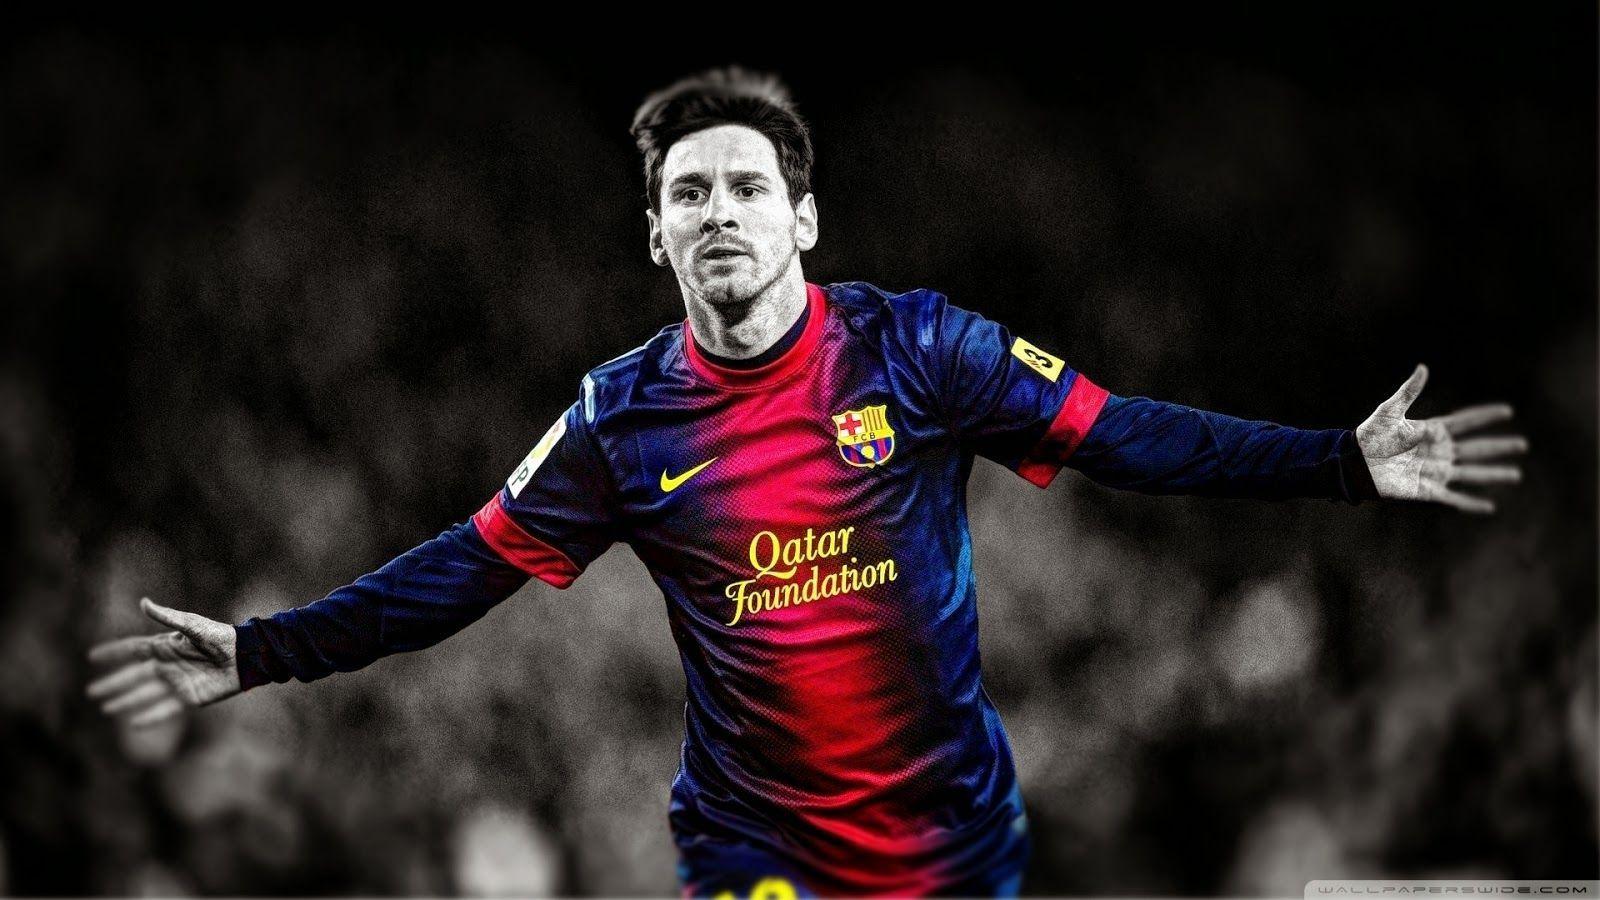 Football Player 2017 Wallpaper On Wallpaper 1080p Hd Lionel Messi Wallpapers Lionel Messi Messi